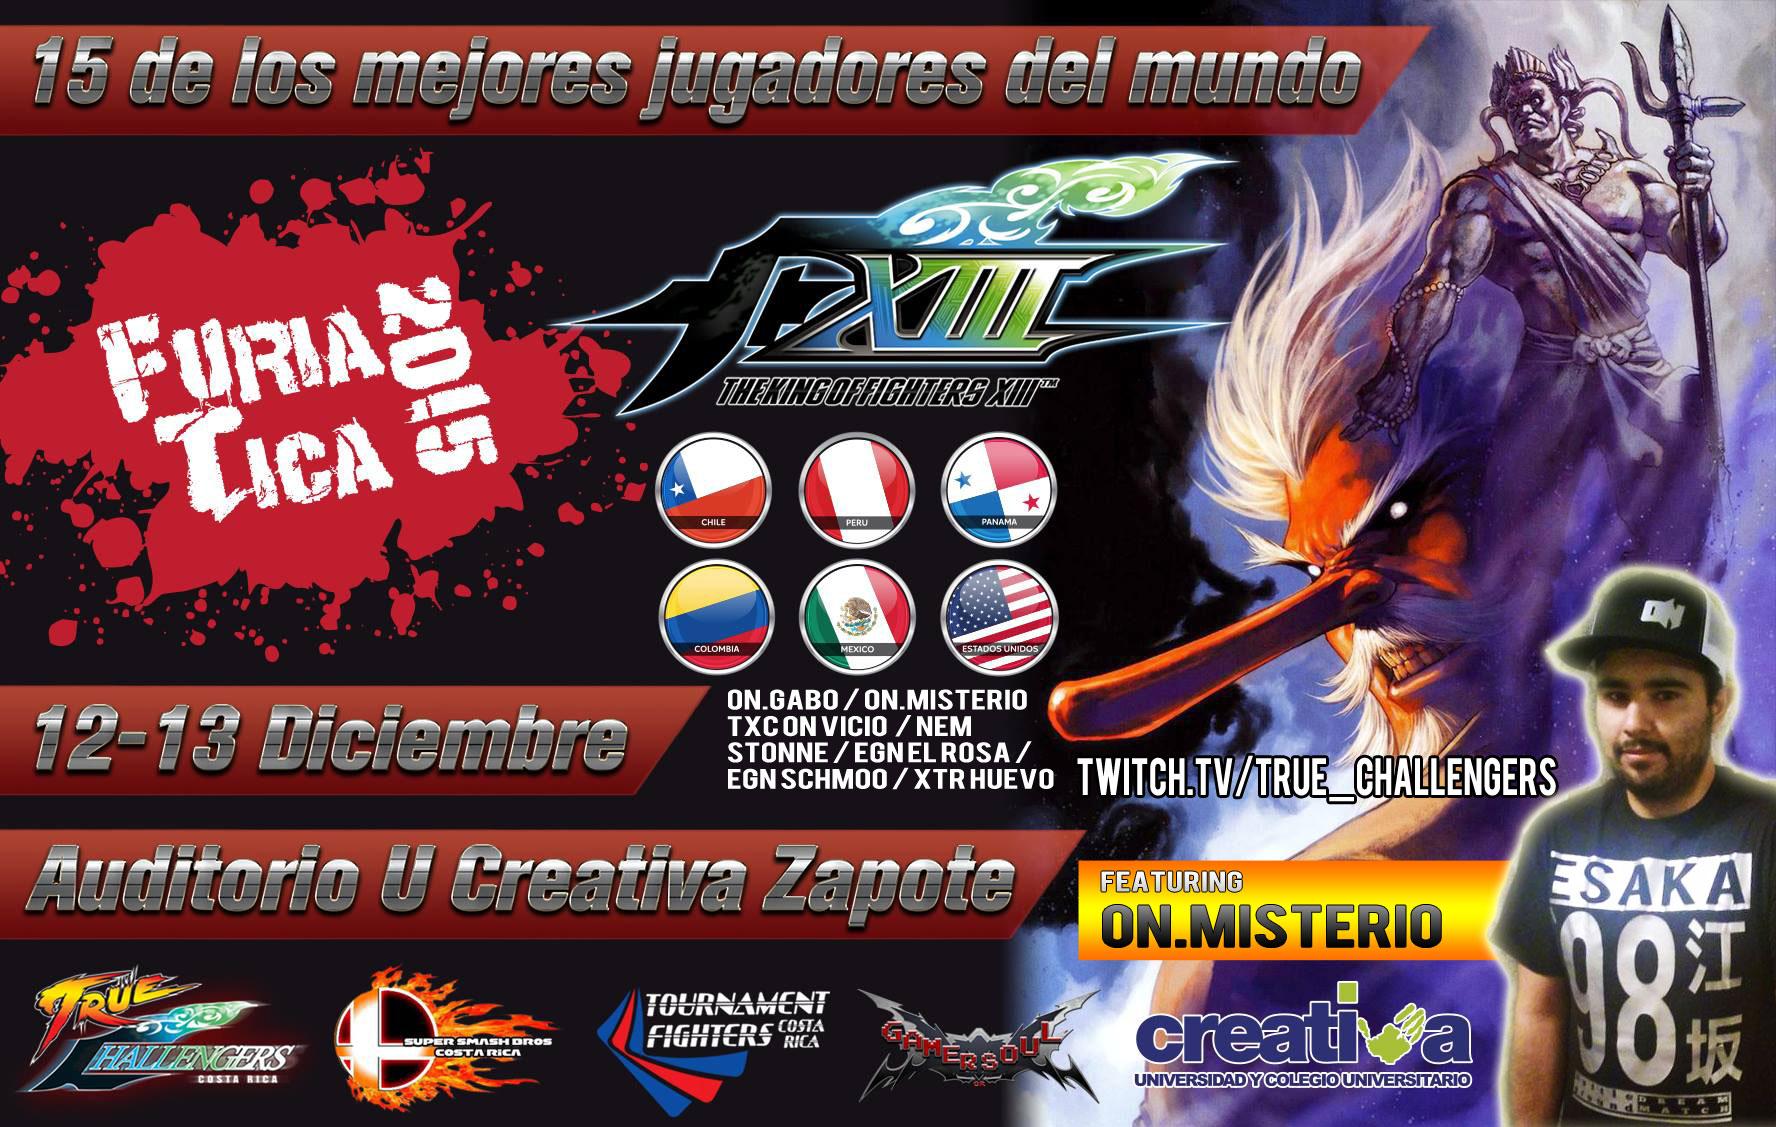 Furia Tica Tournament feat Misterio Streaming Now #FuriaTica #NEC16